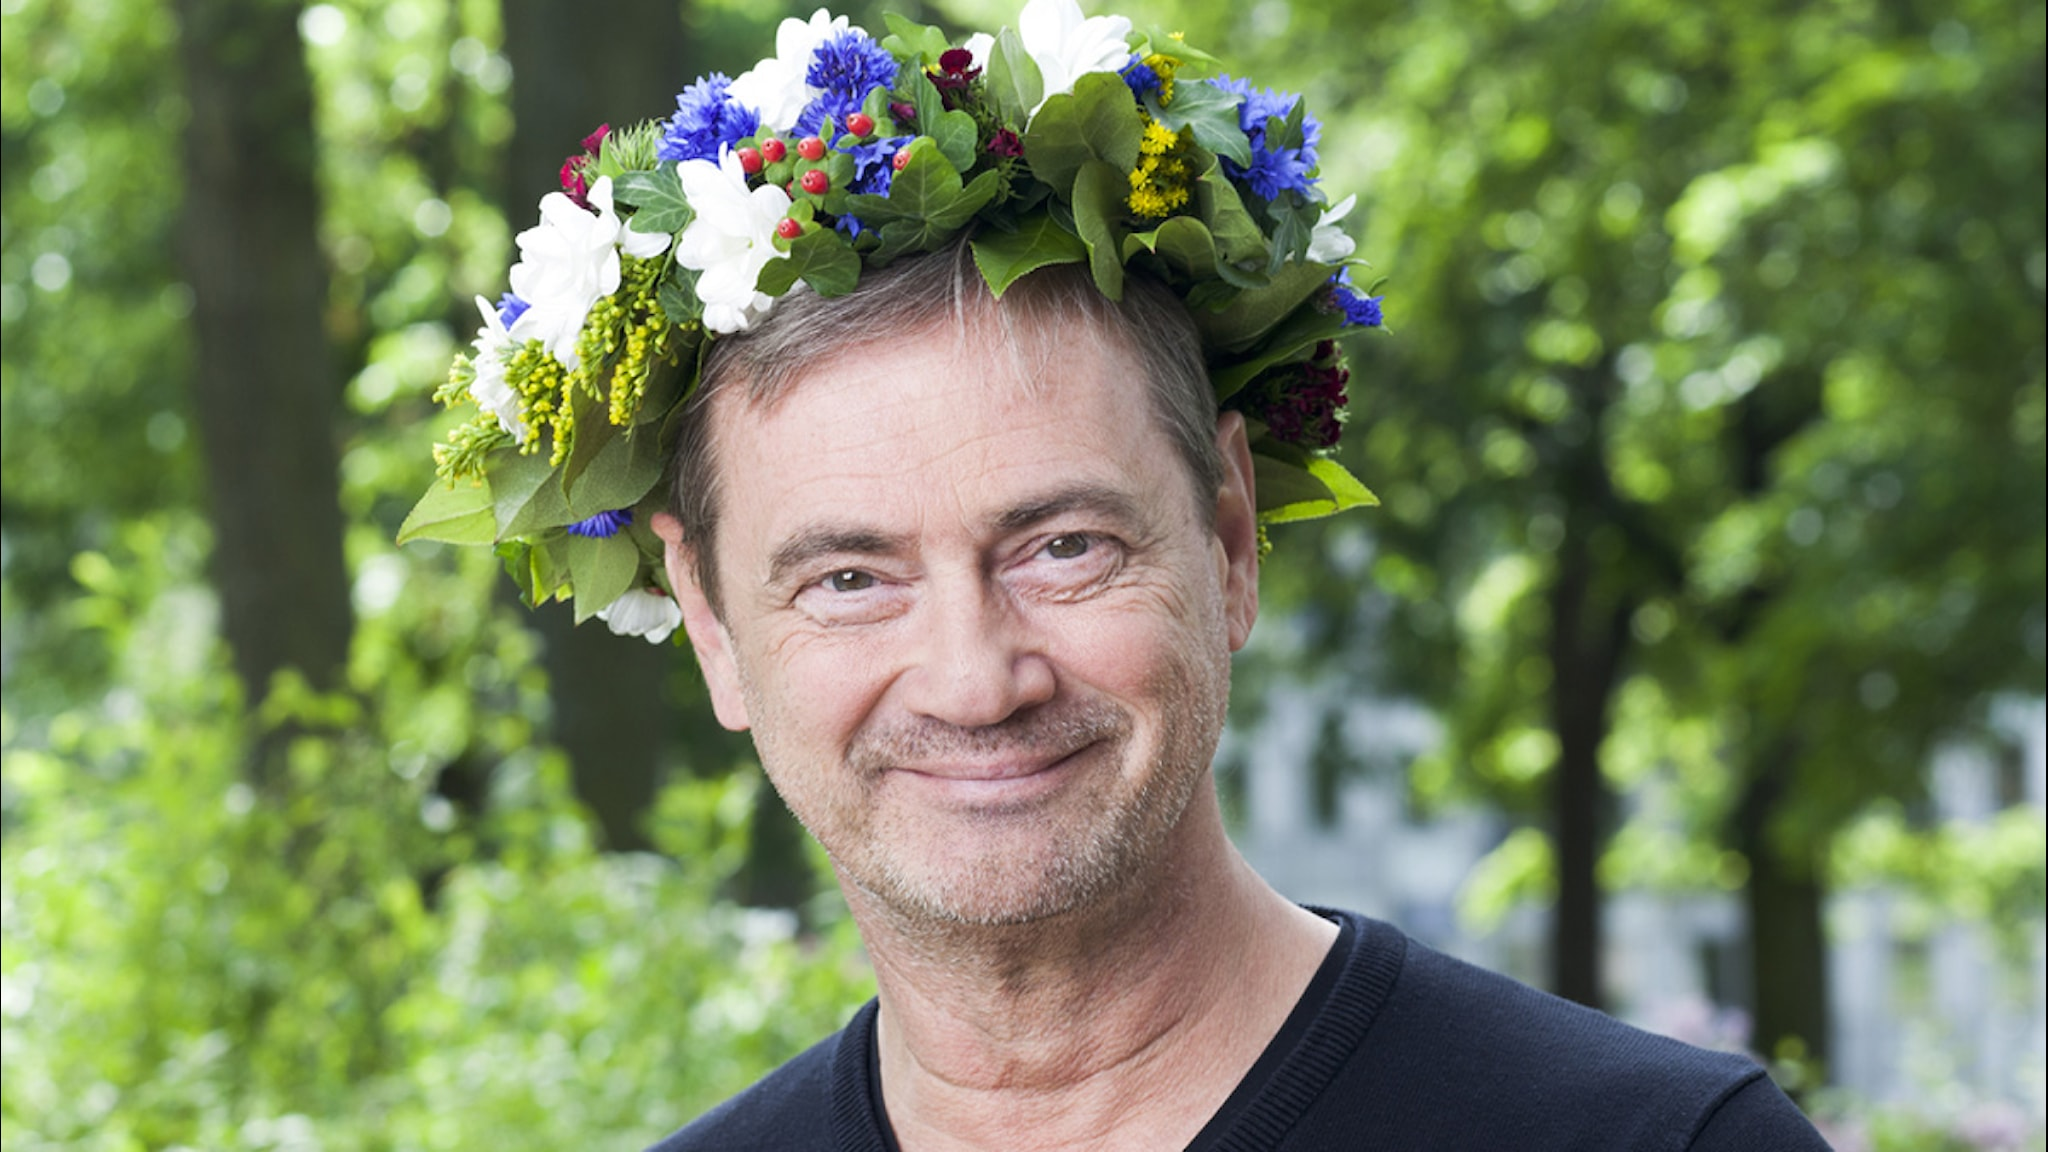 Christer Björkman foto: Mattias Ahlm/Sveriges Radio